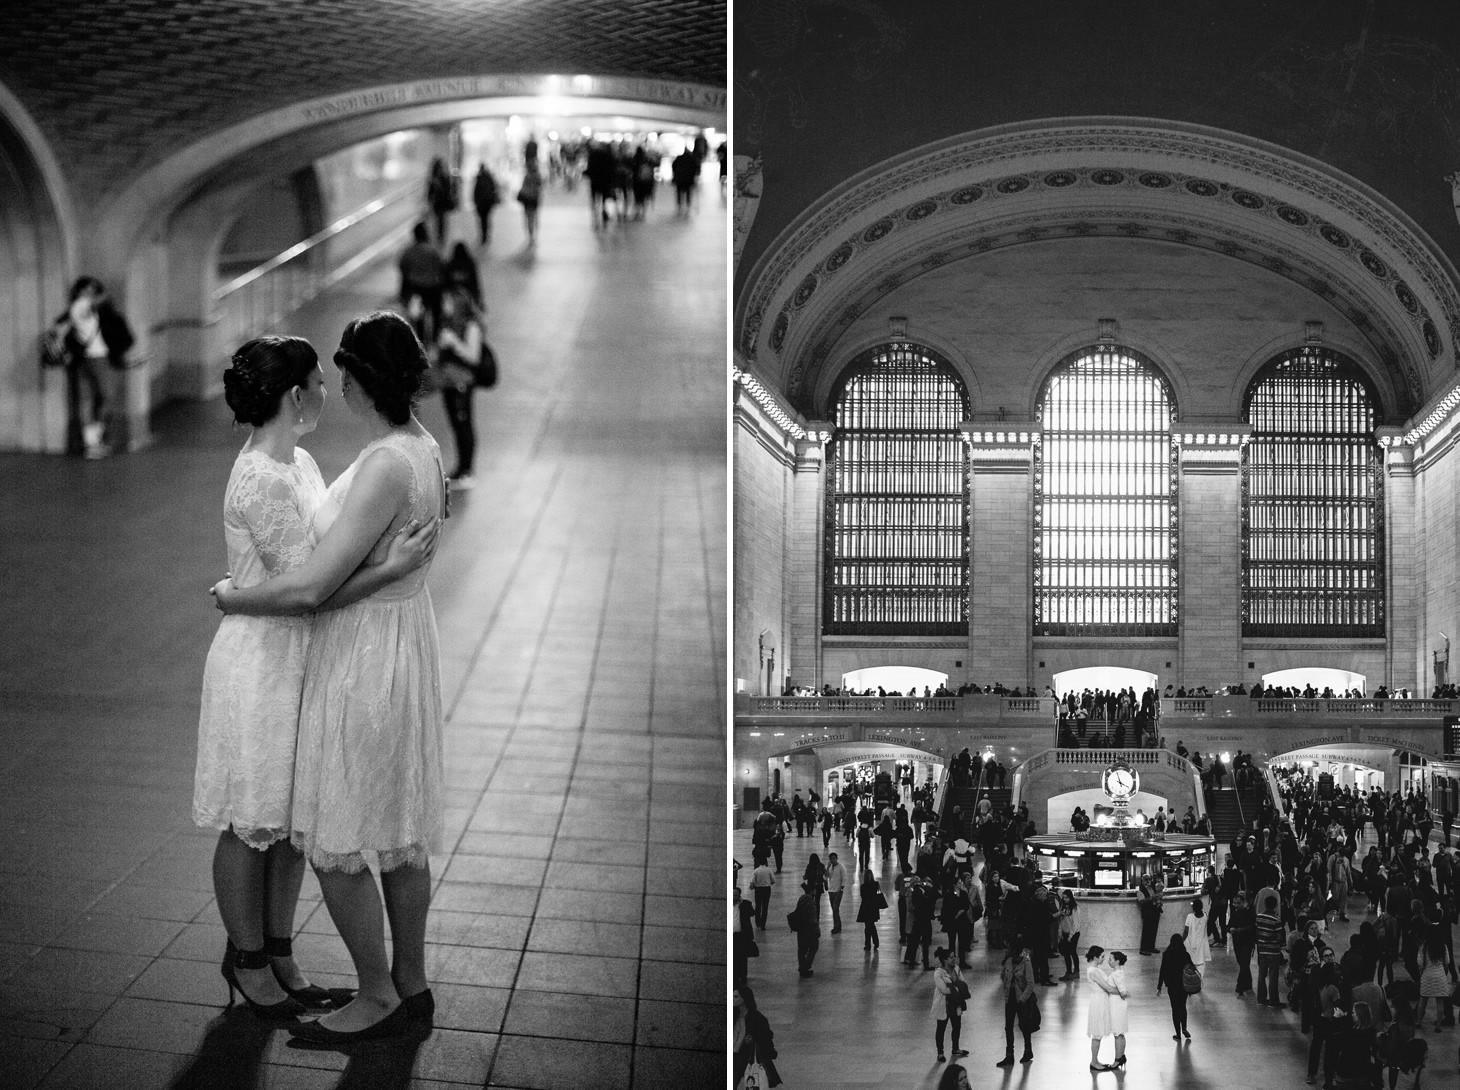 014-nyc-wedding-elopement-lgbt-friendly-photographer-city-hall-grand-central.jpg